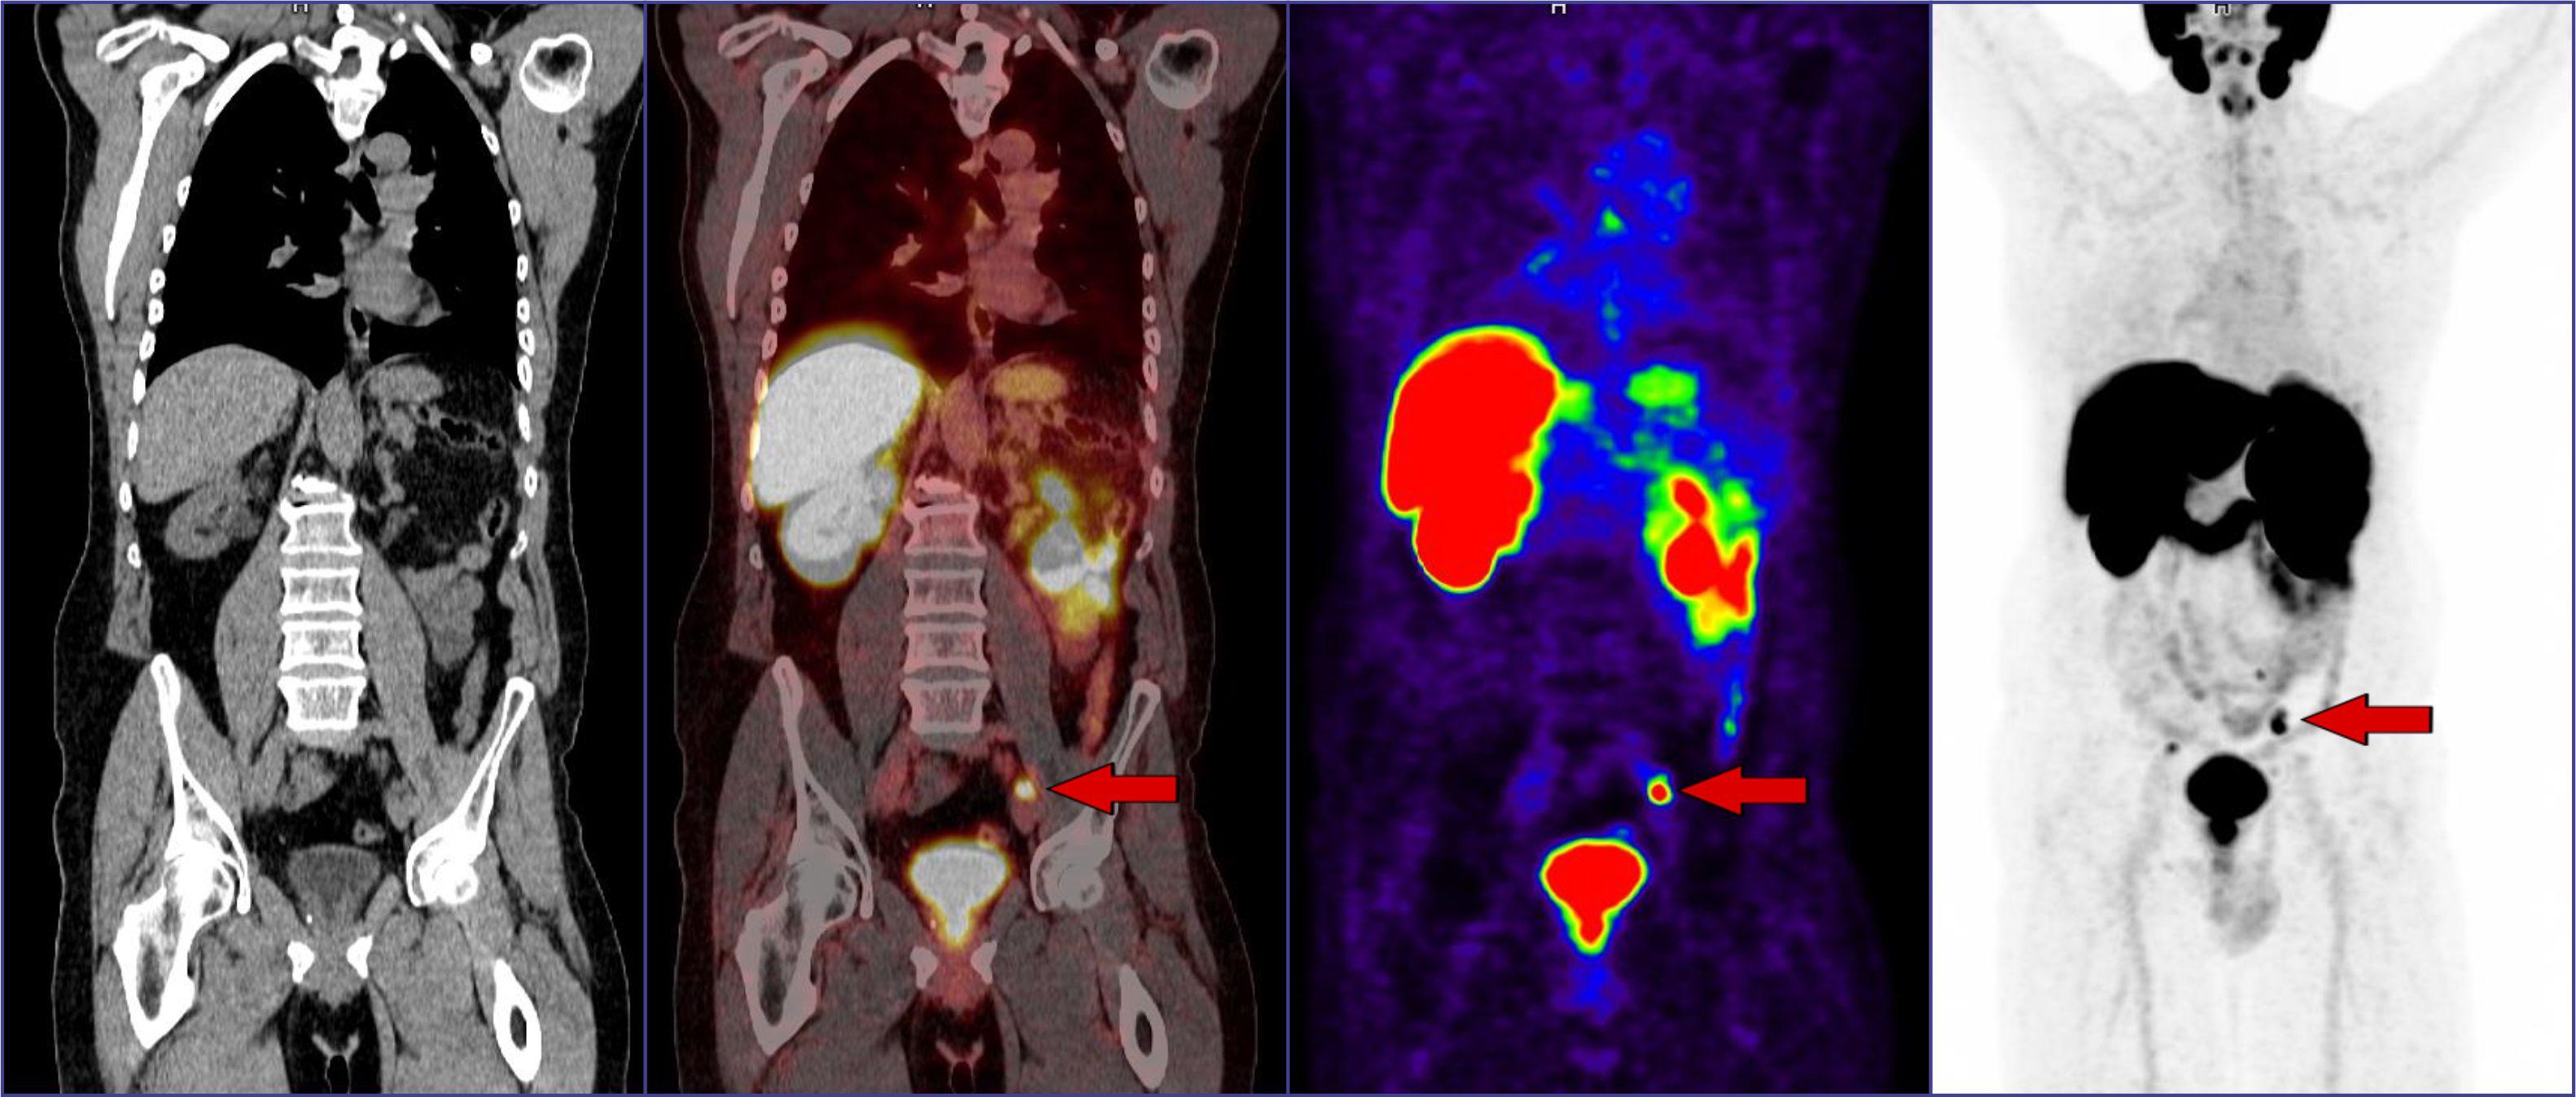 peti-pozitronuli-emisiuri-tomografia